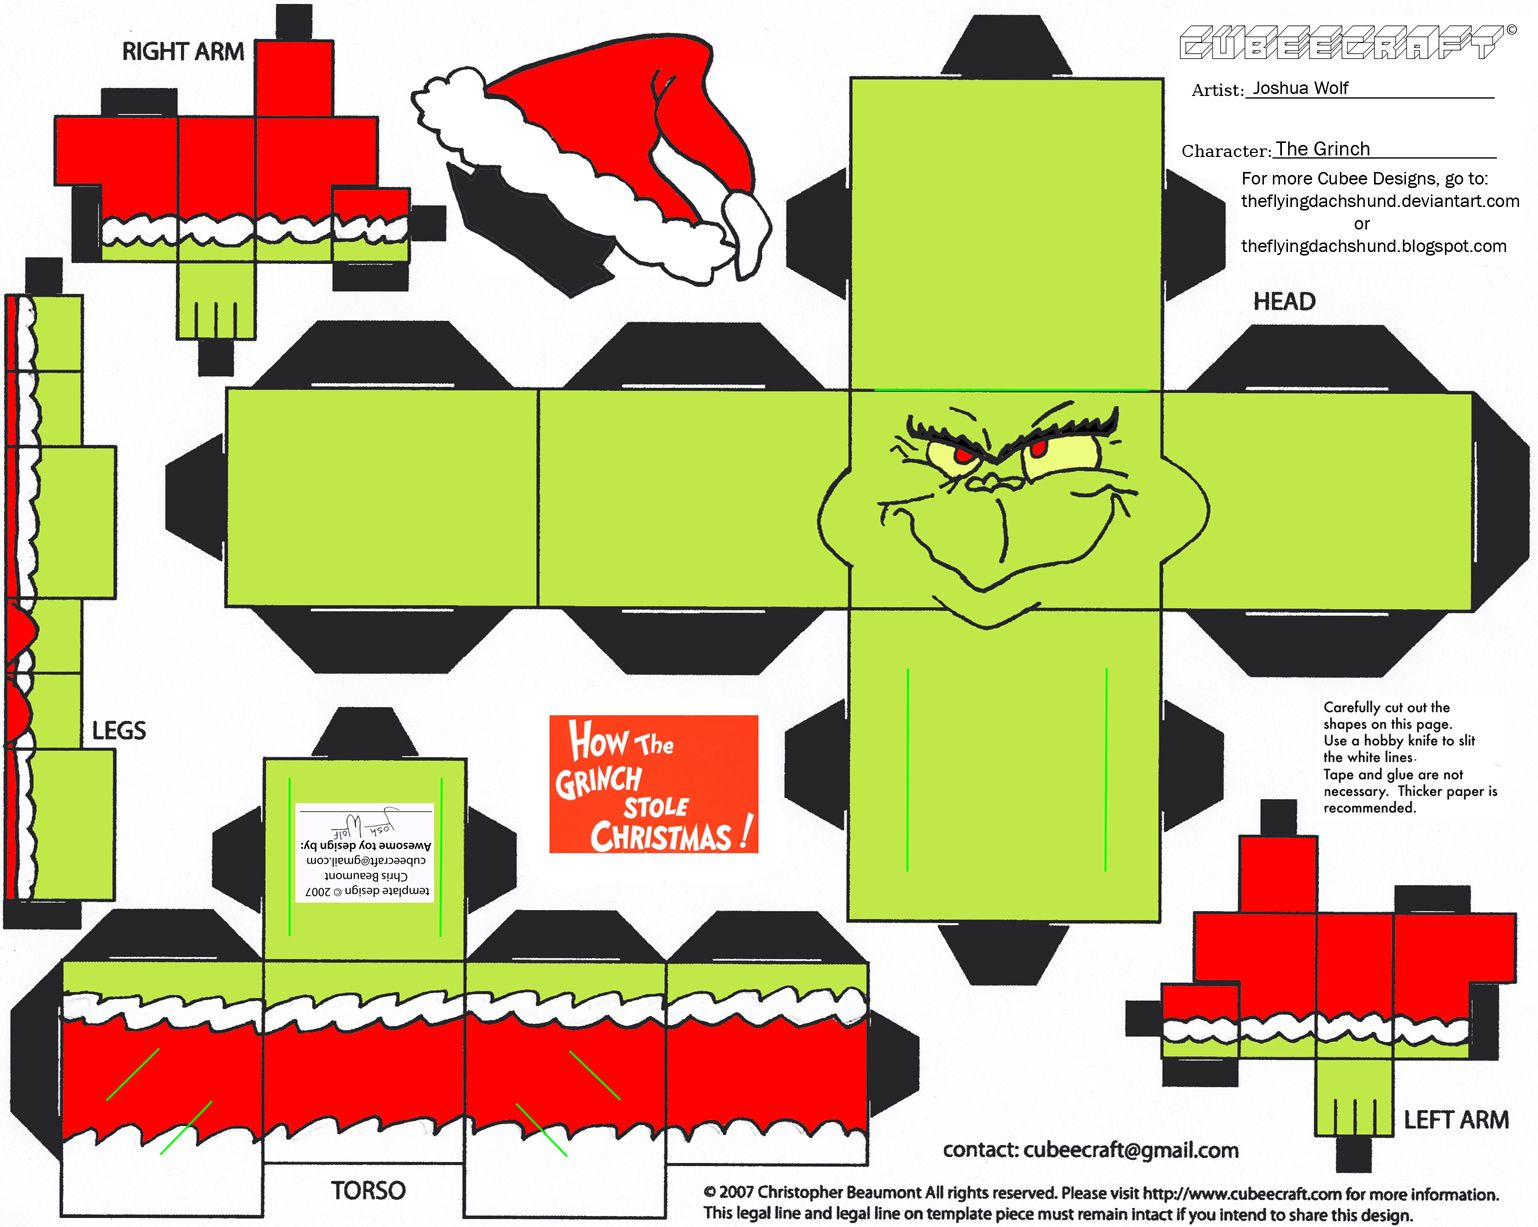 The Grinch Cubee By Theflyingdachshundviantart